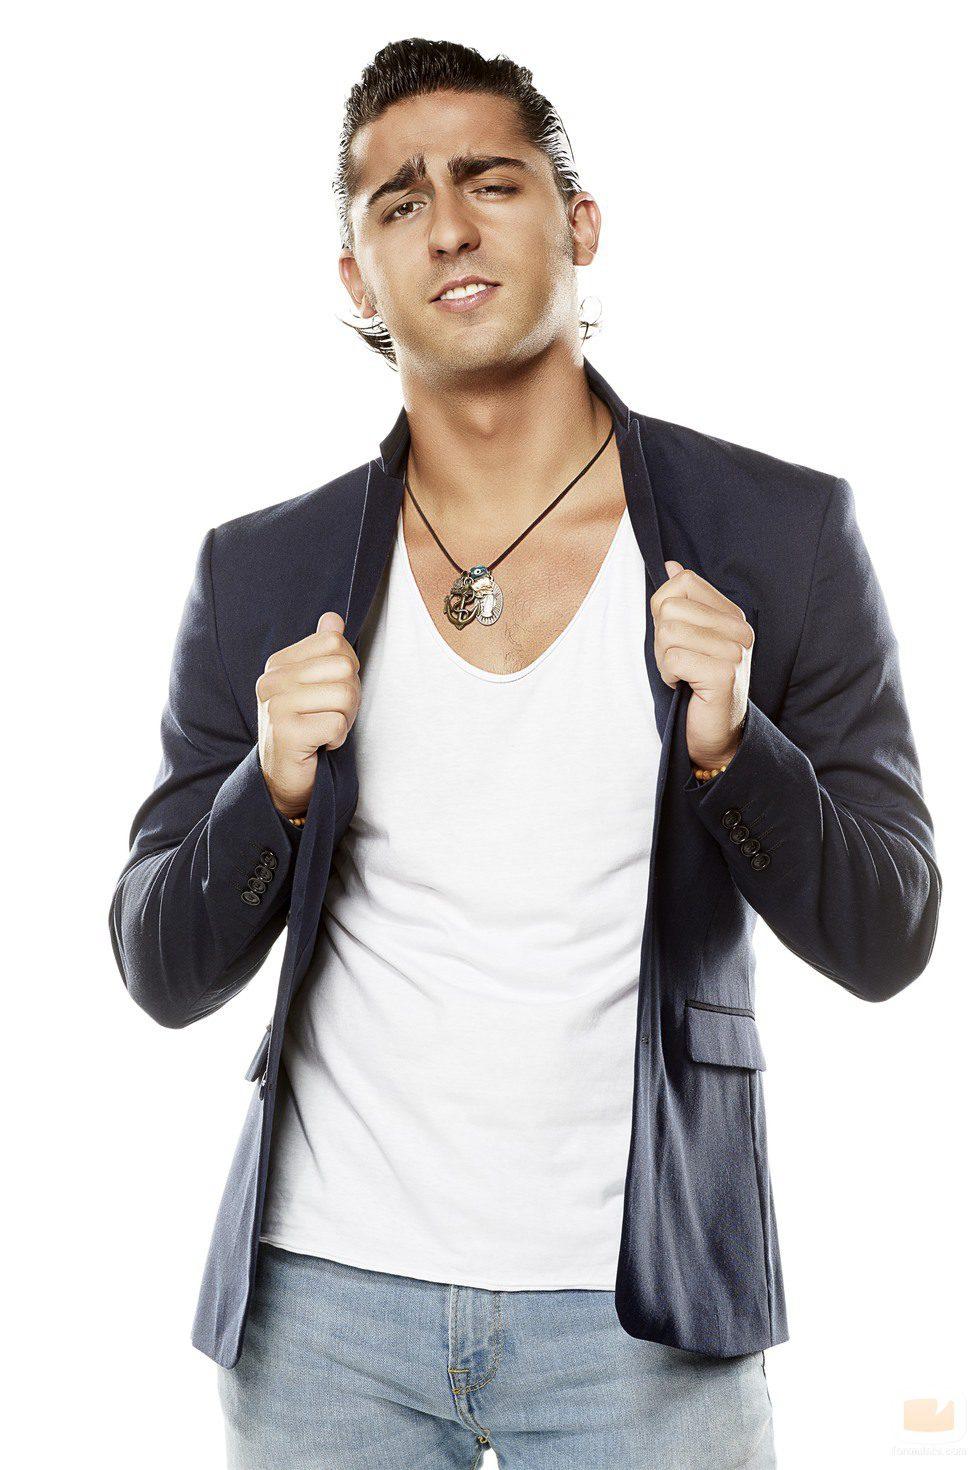 Caballero, participante del nuevo 'MTV Super Shore': Fotos - FormulaTV